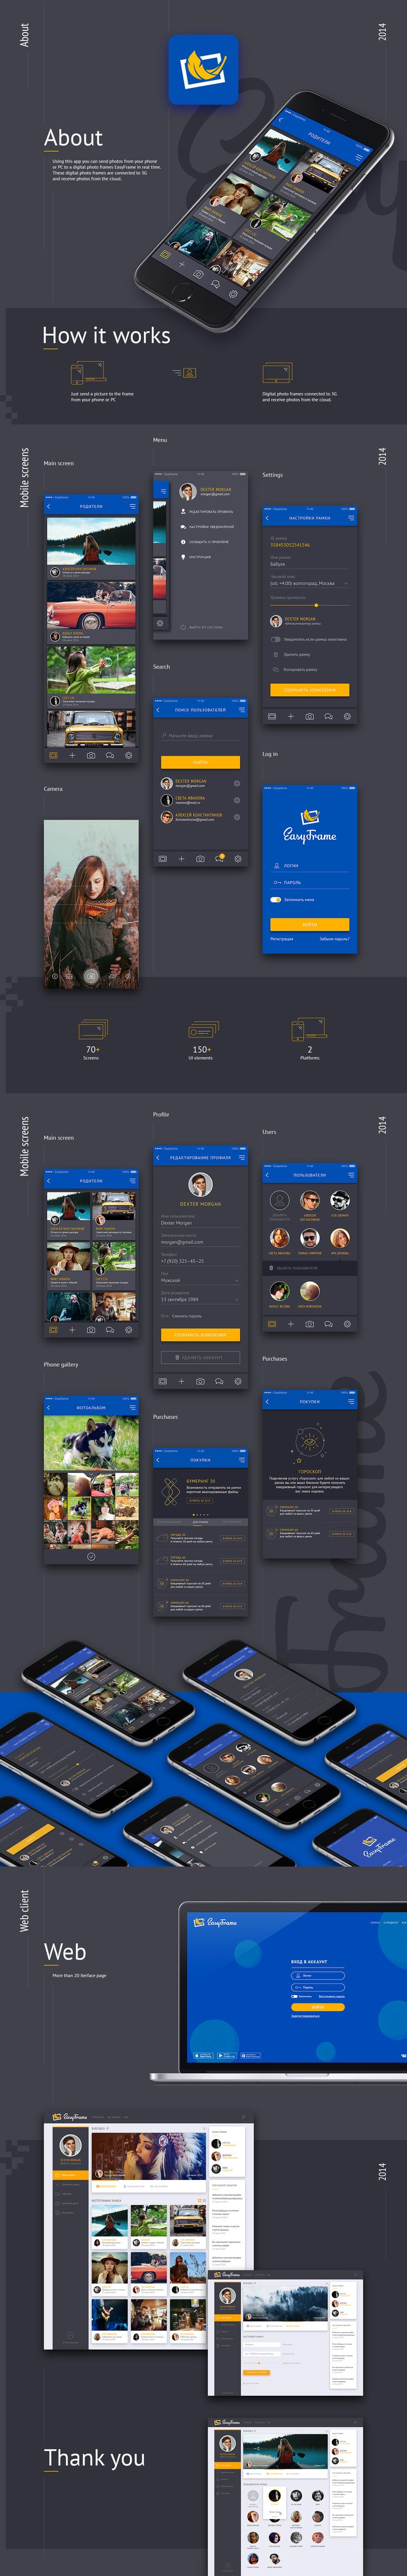 EasyFrame iOS, Android & web app. 2014. on Behance